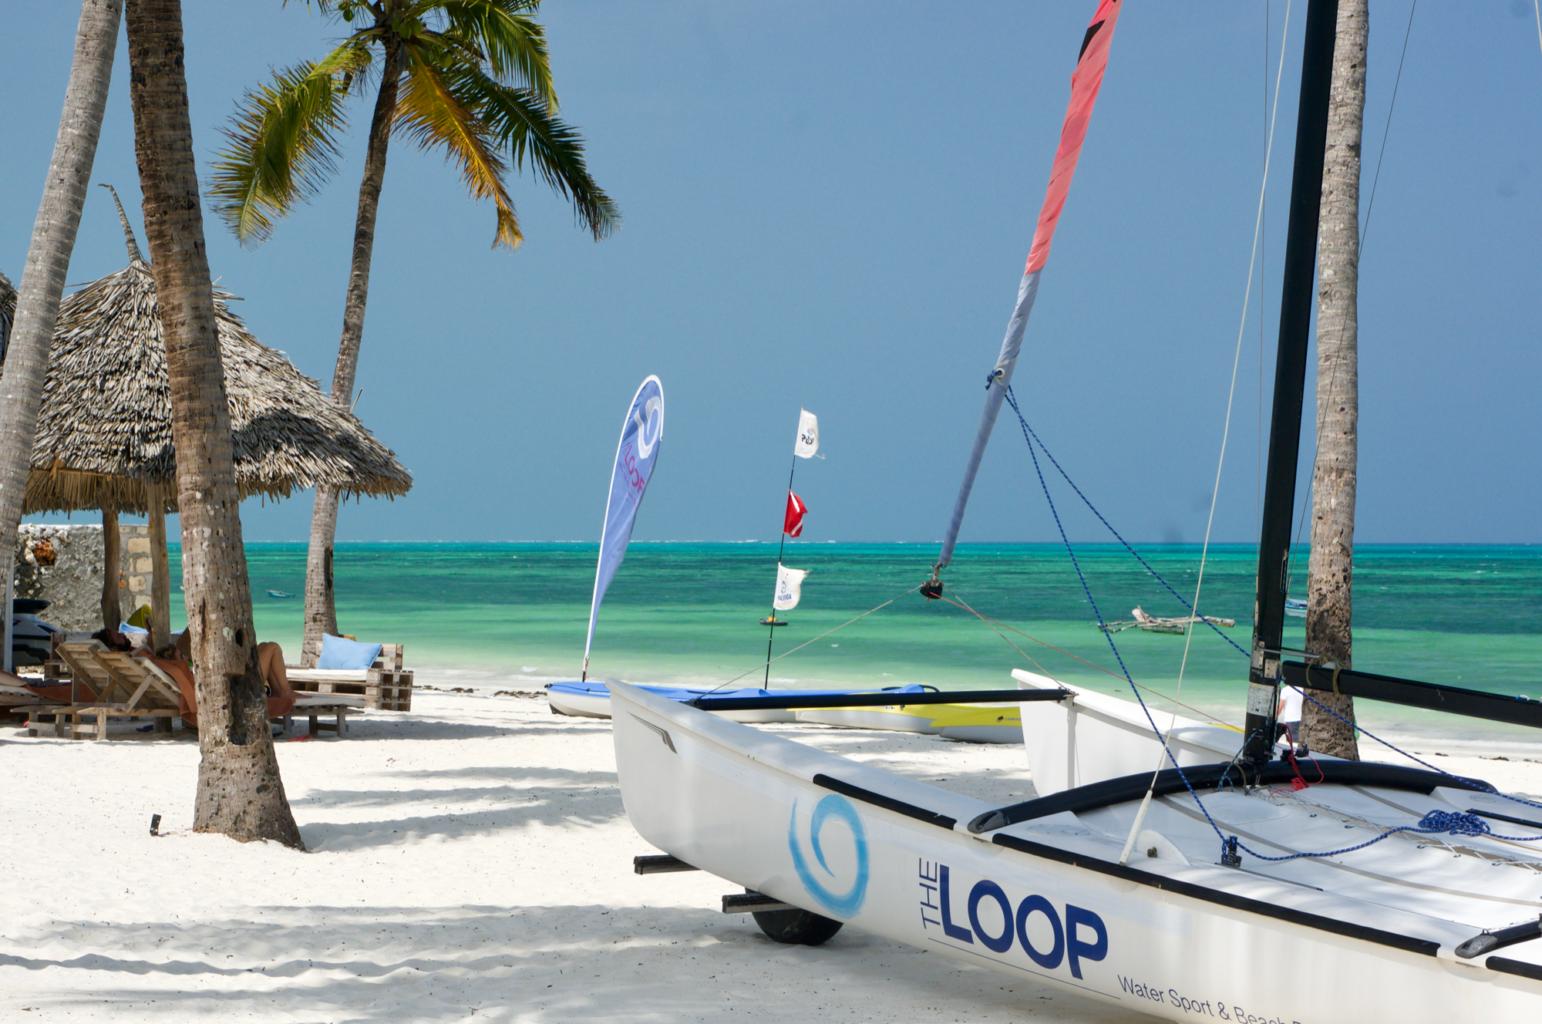 Zanzibar bounty eiland